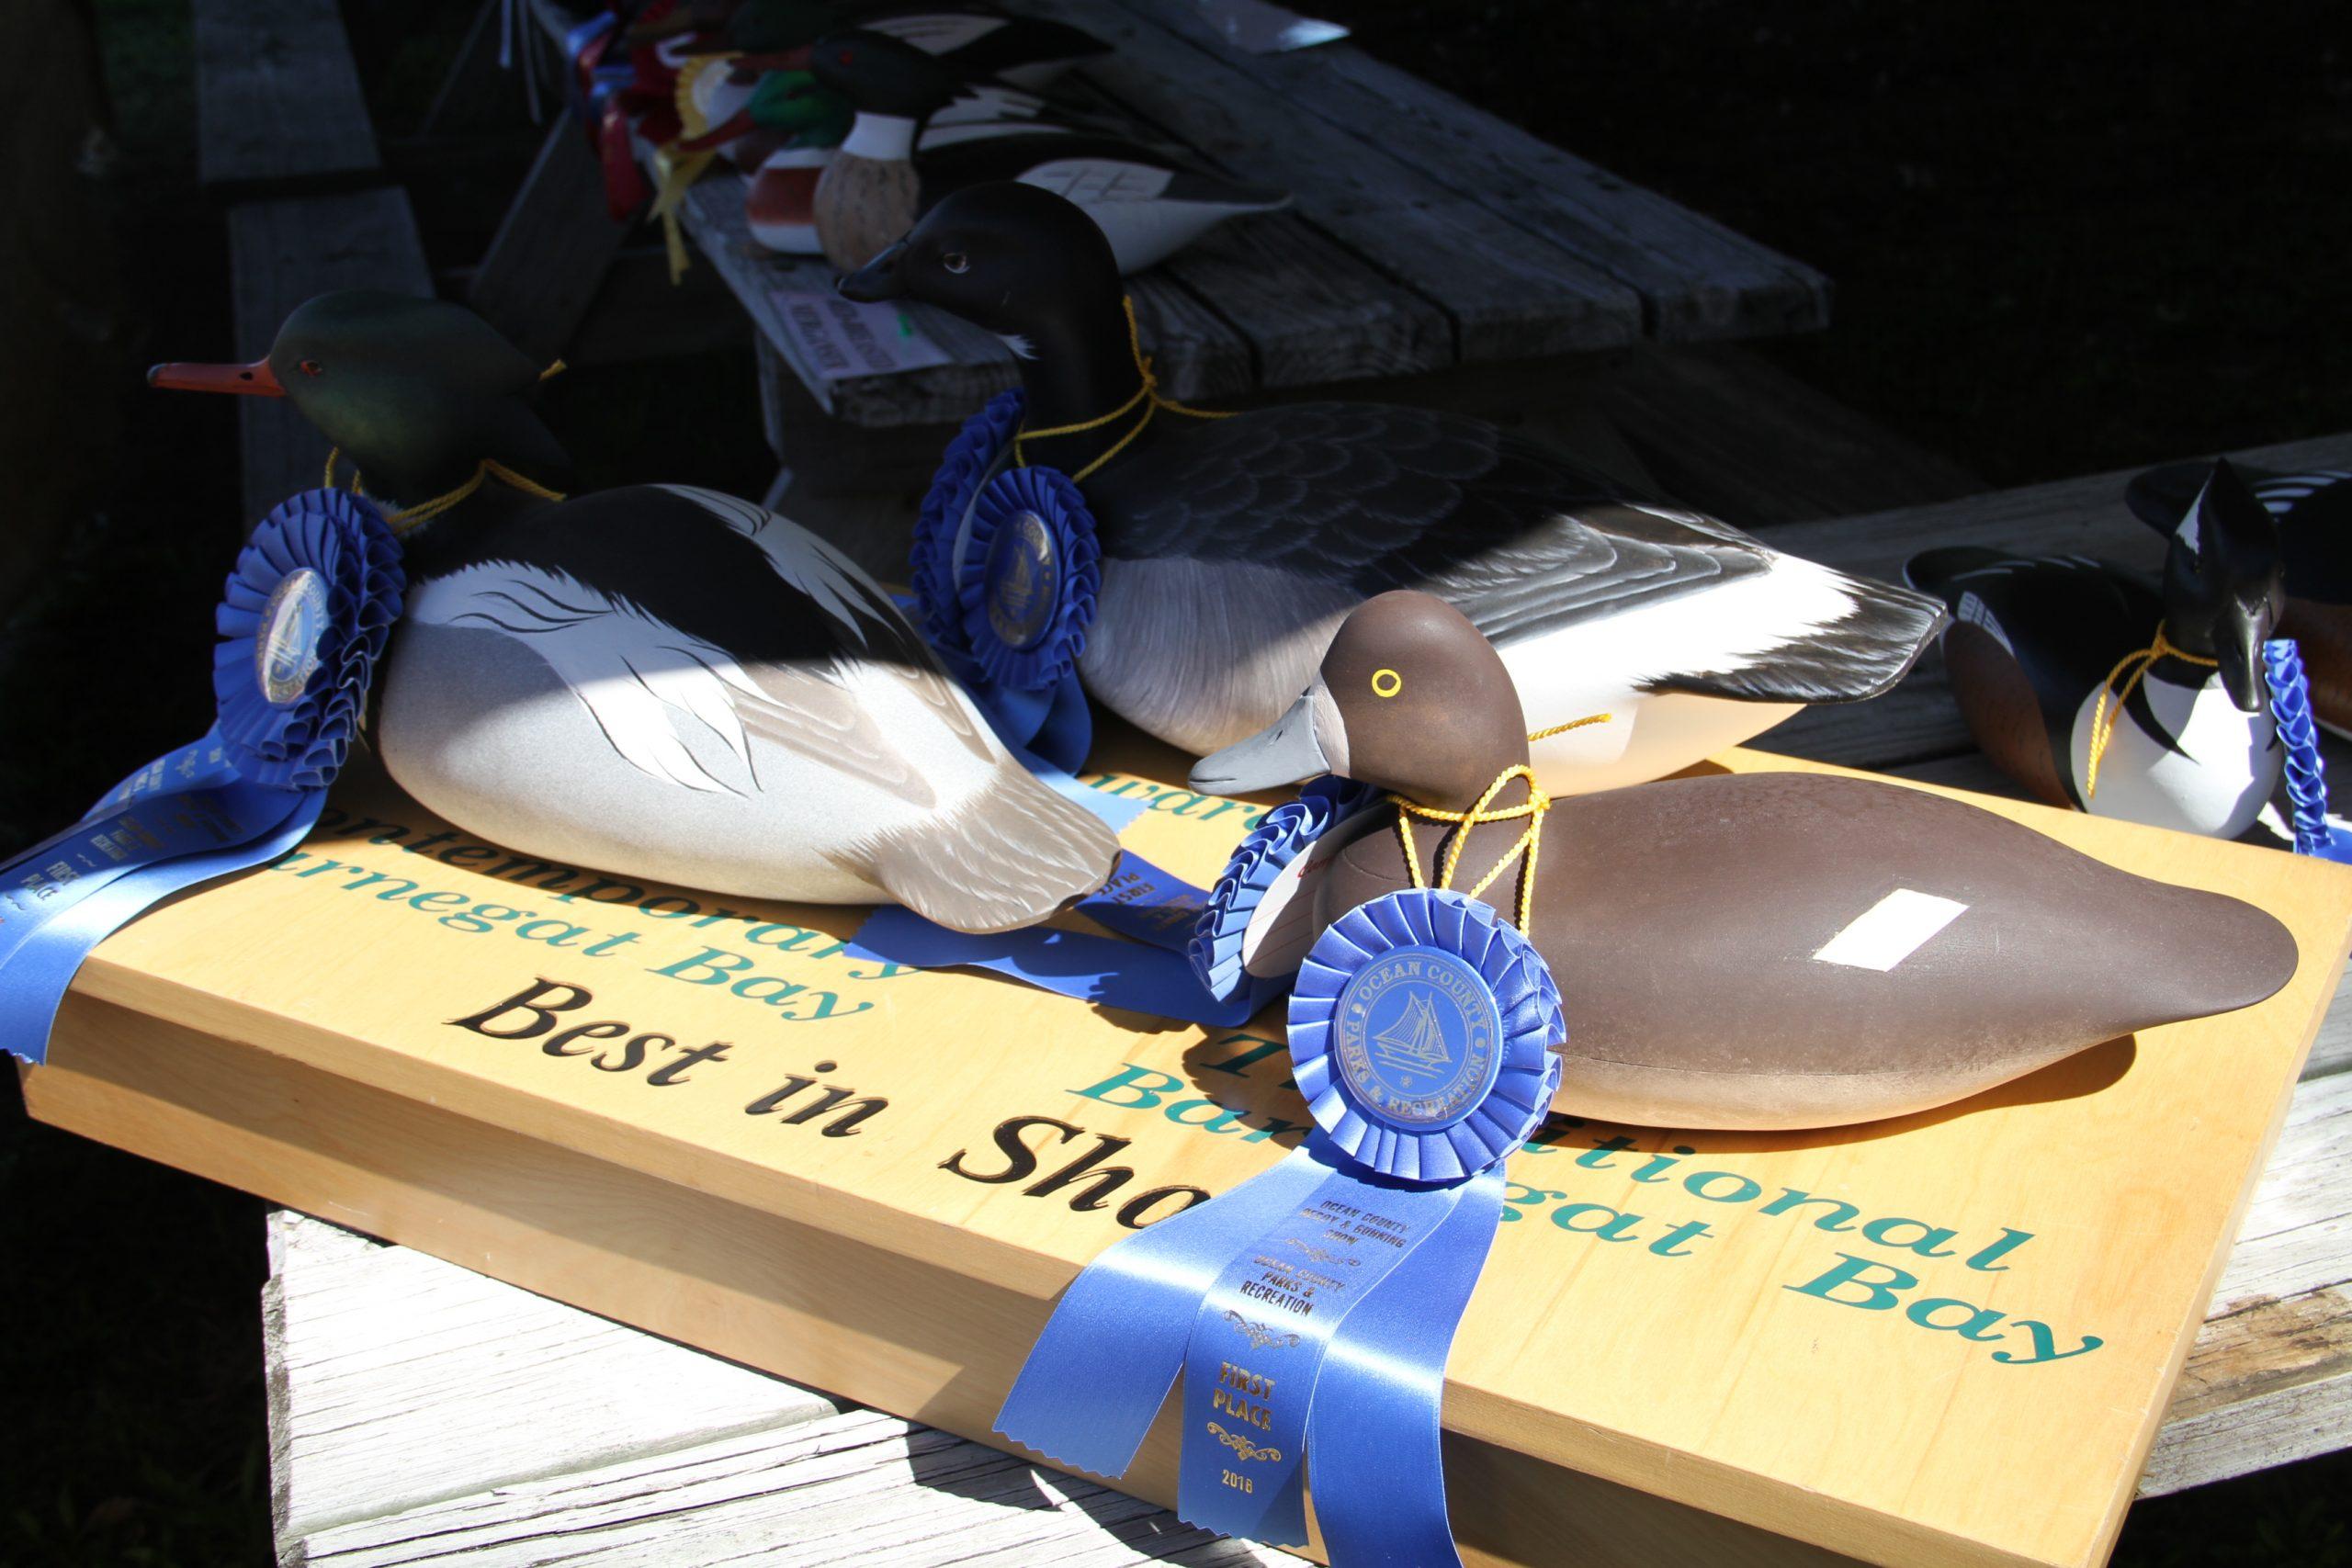 A decoy entered in Ocean County's annual baymen's show. (Photo: Ocean County)